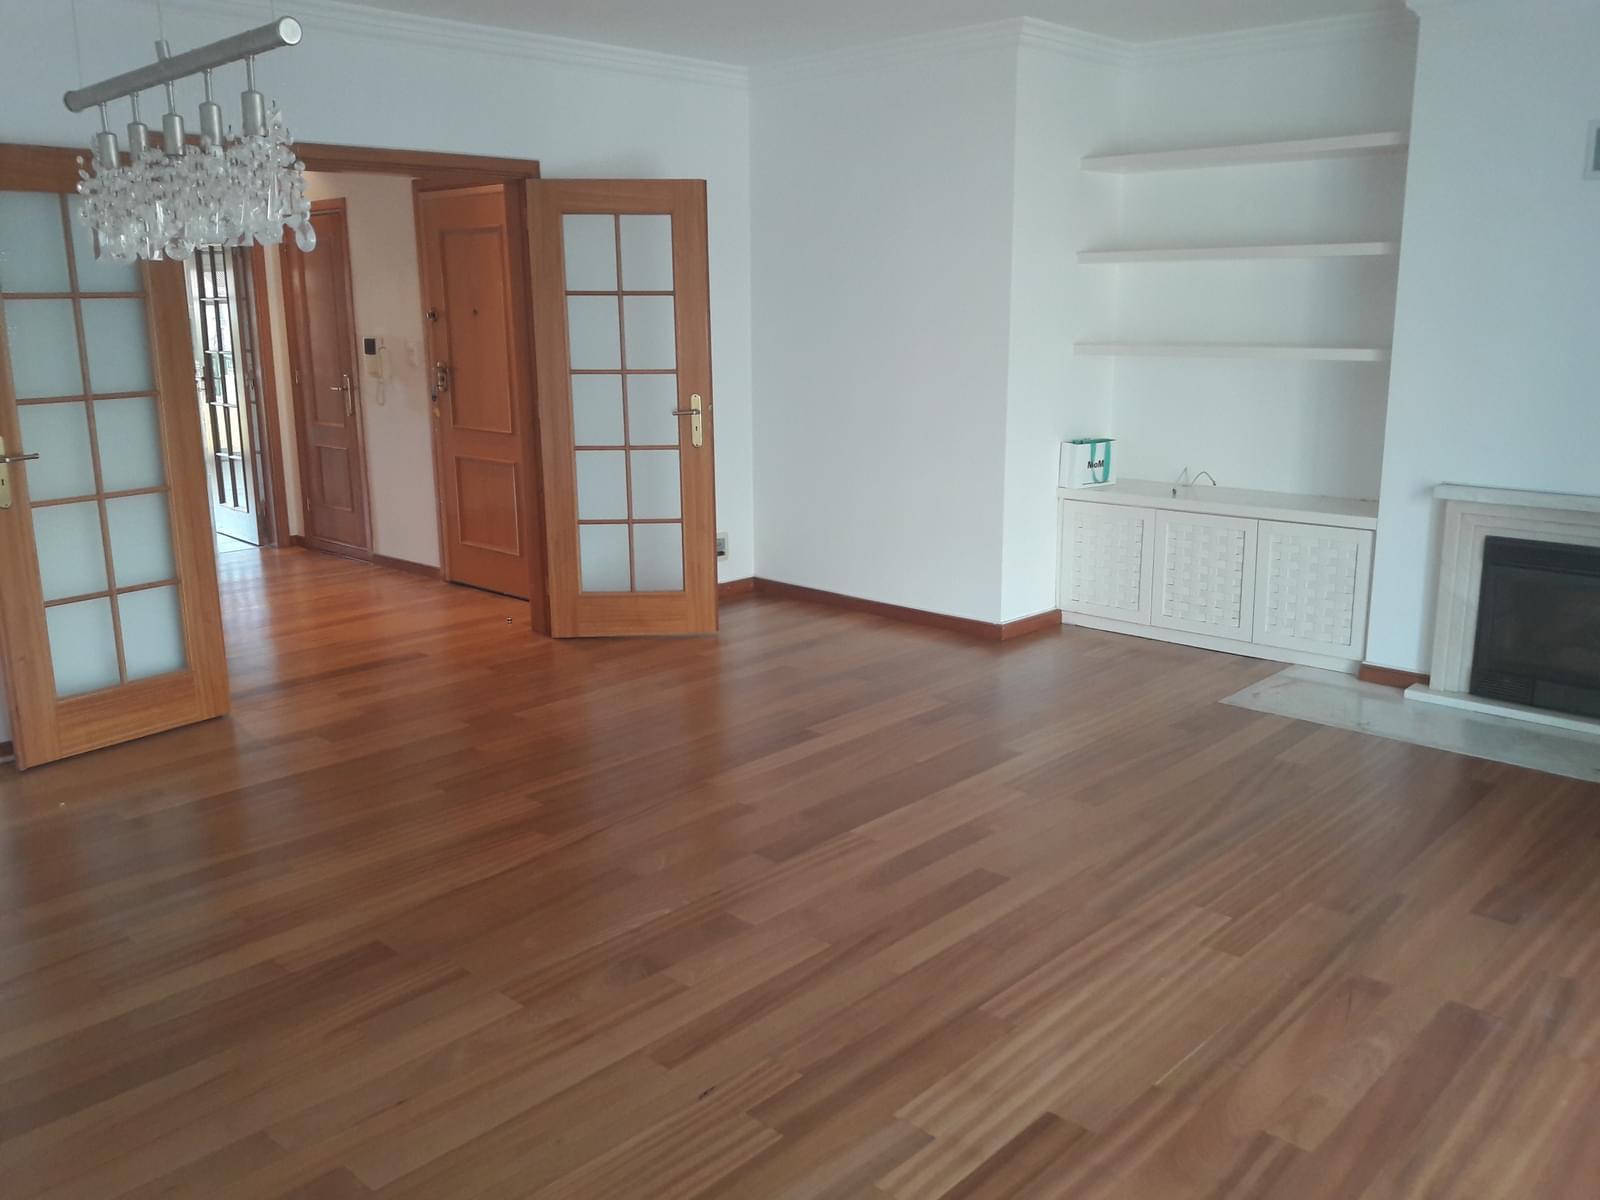 pf18038-apartamento-t3-735fb440-dbe3-406a-8c46-2a0ce6617aa5